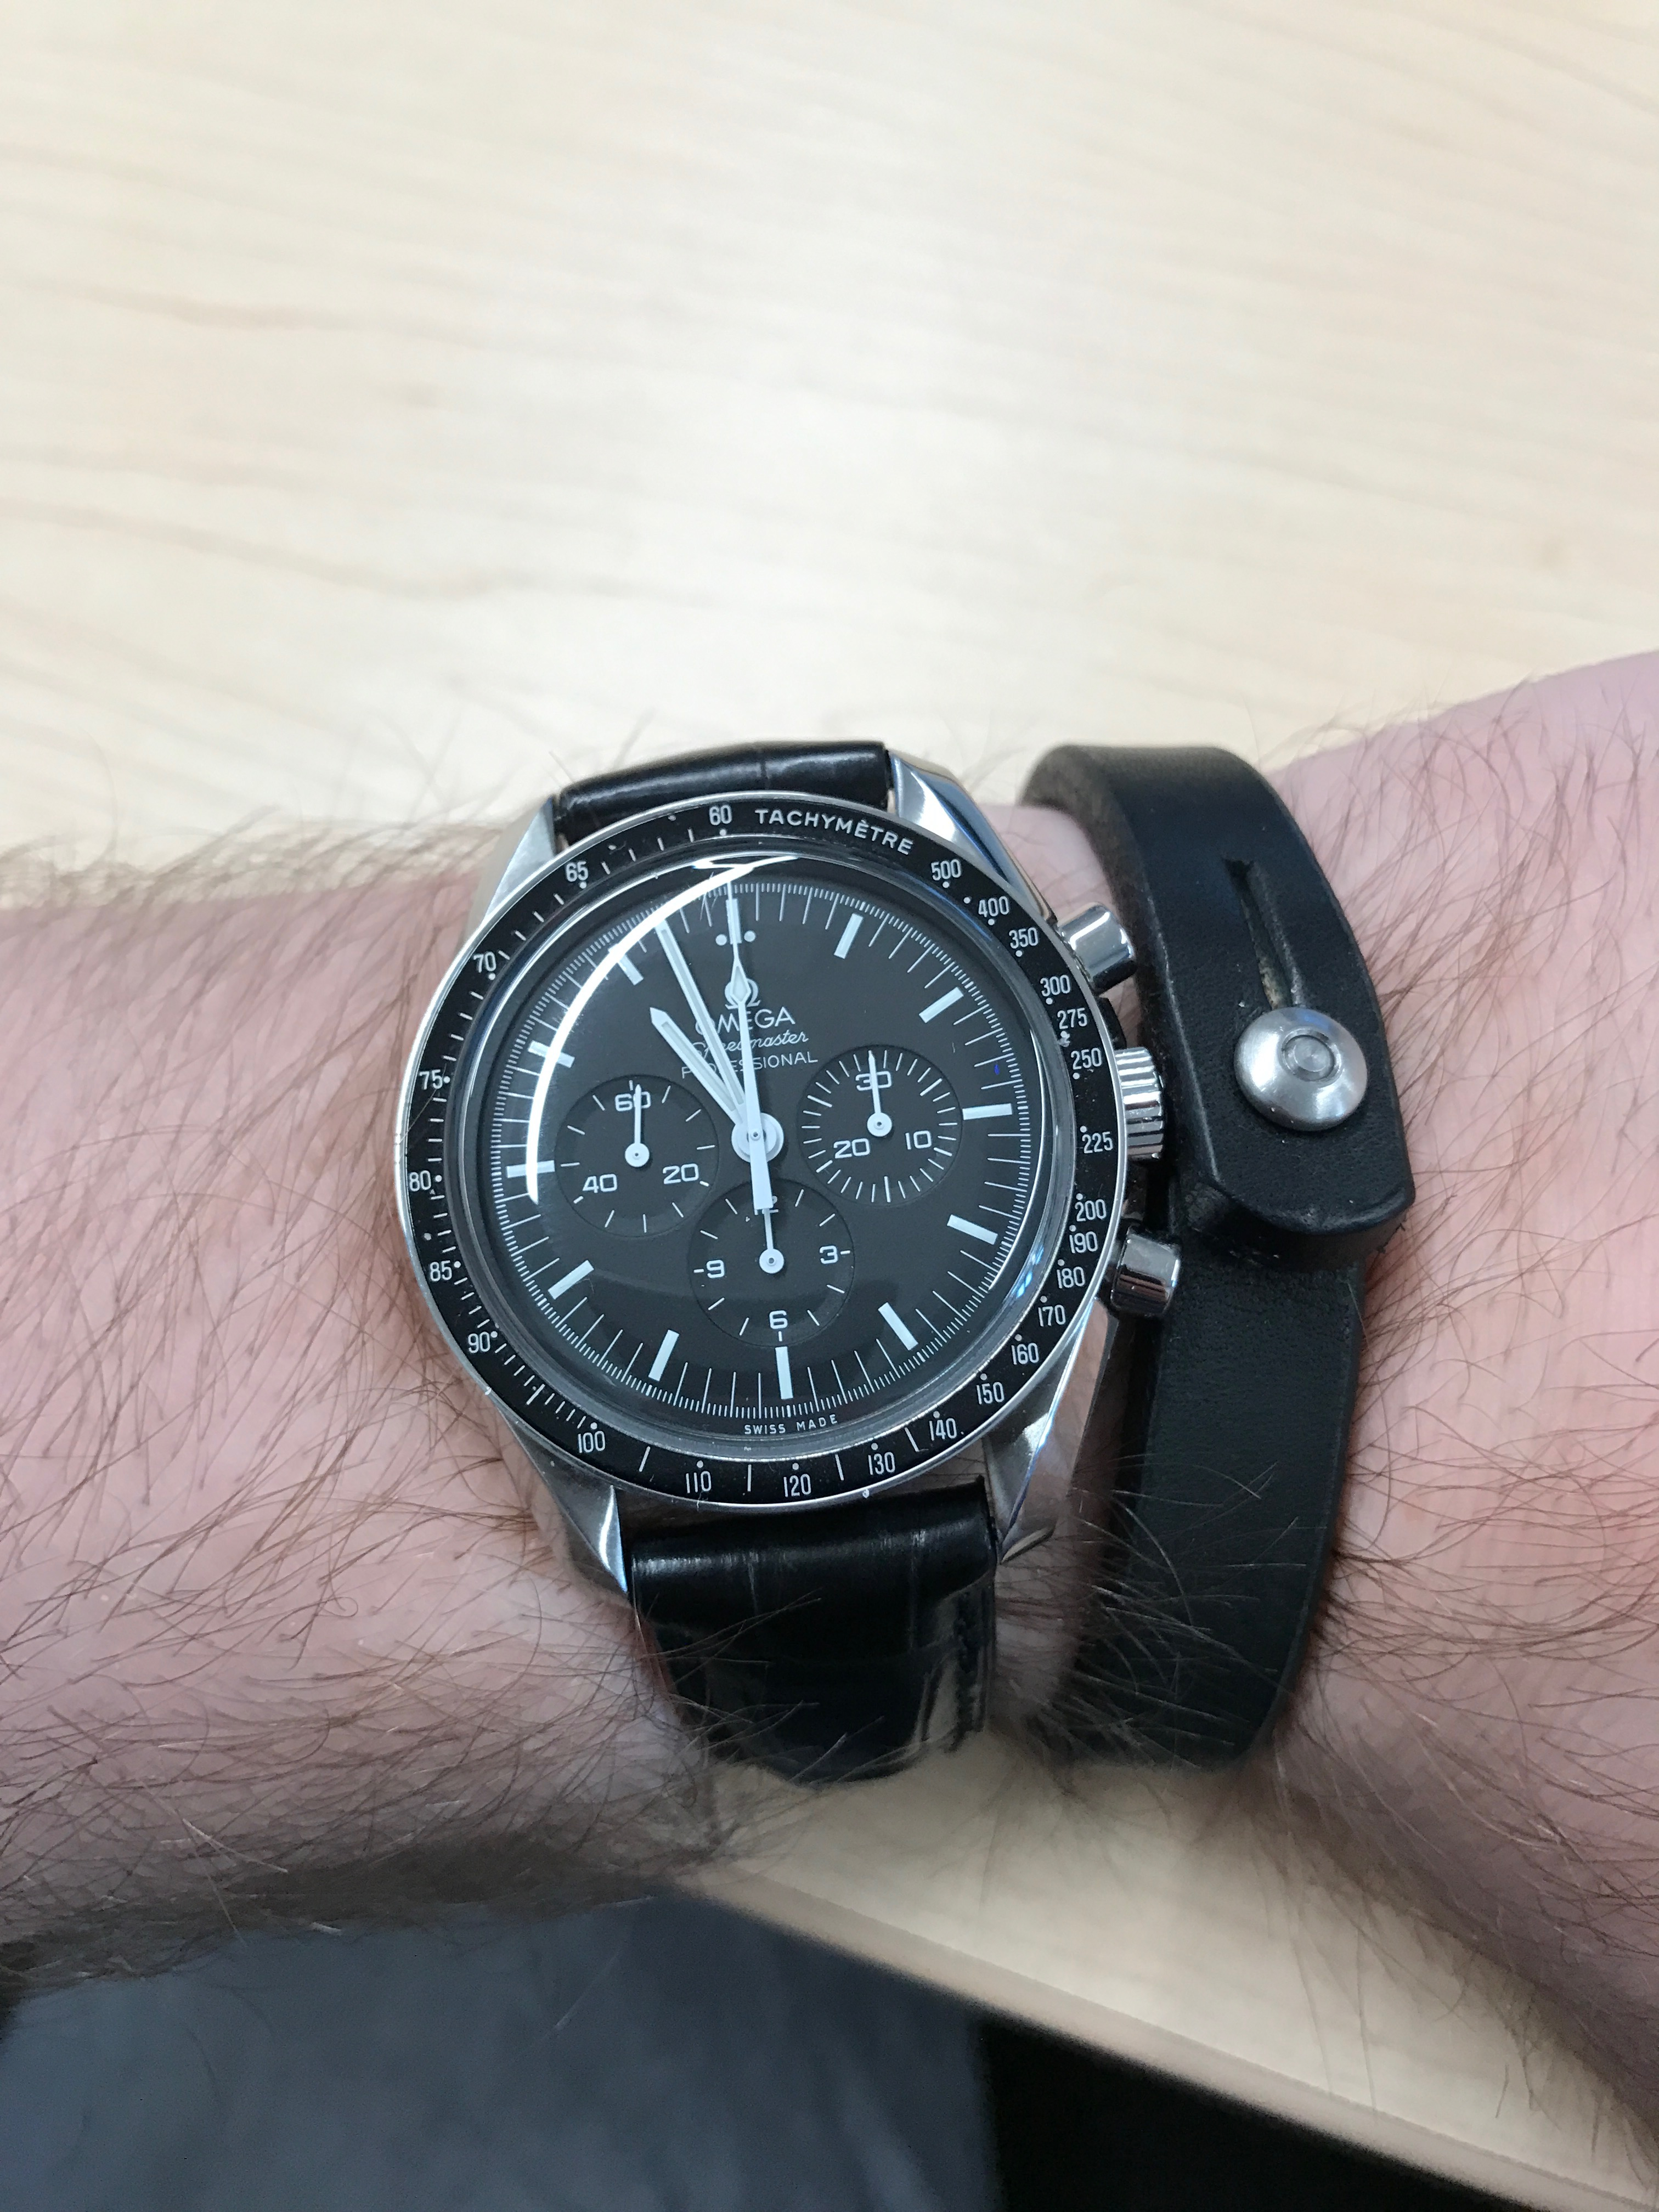 Bracelet On Same Wrist As Watch